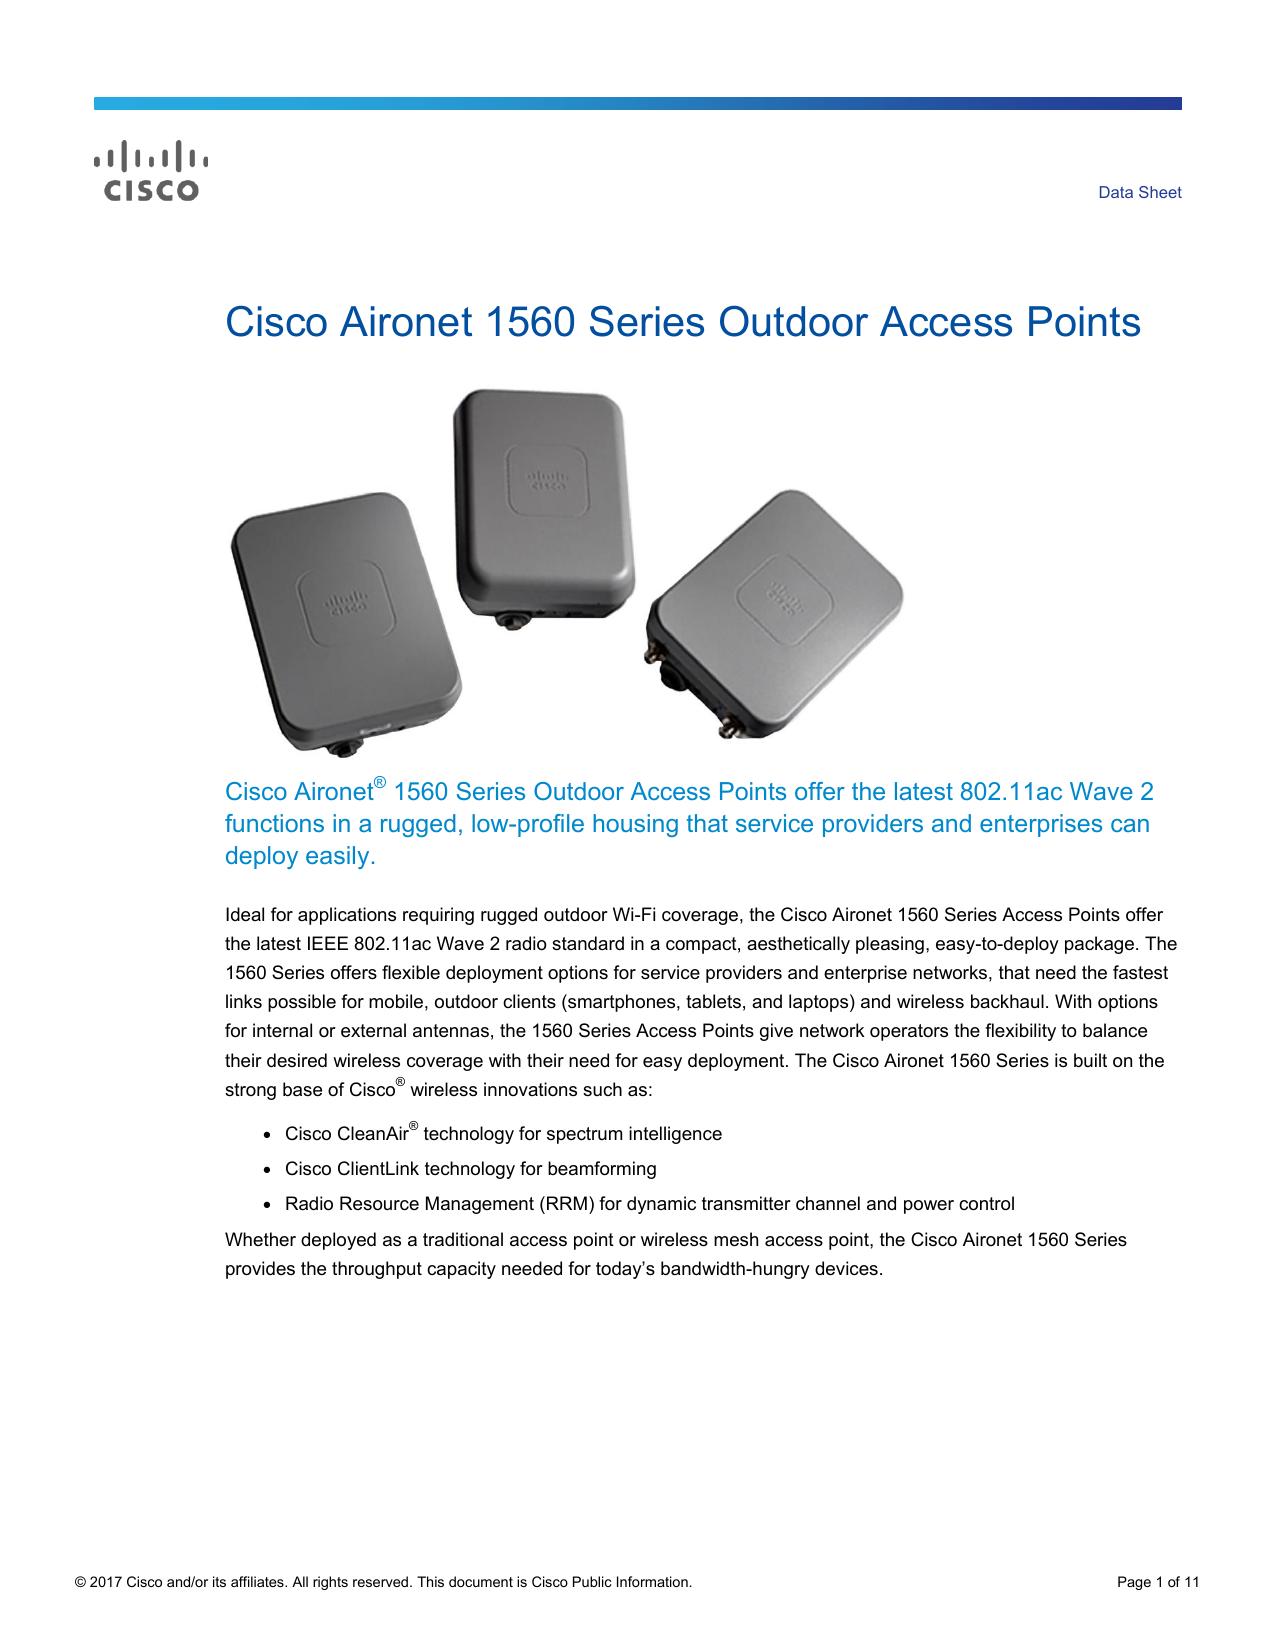 Cisco Aironet 1560 Series Outdoor Access Points Data Sheet